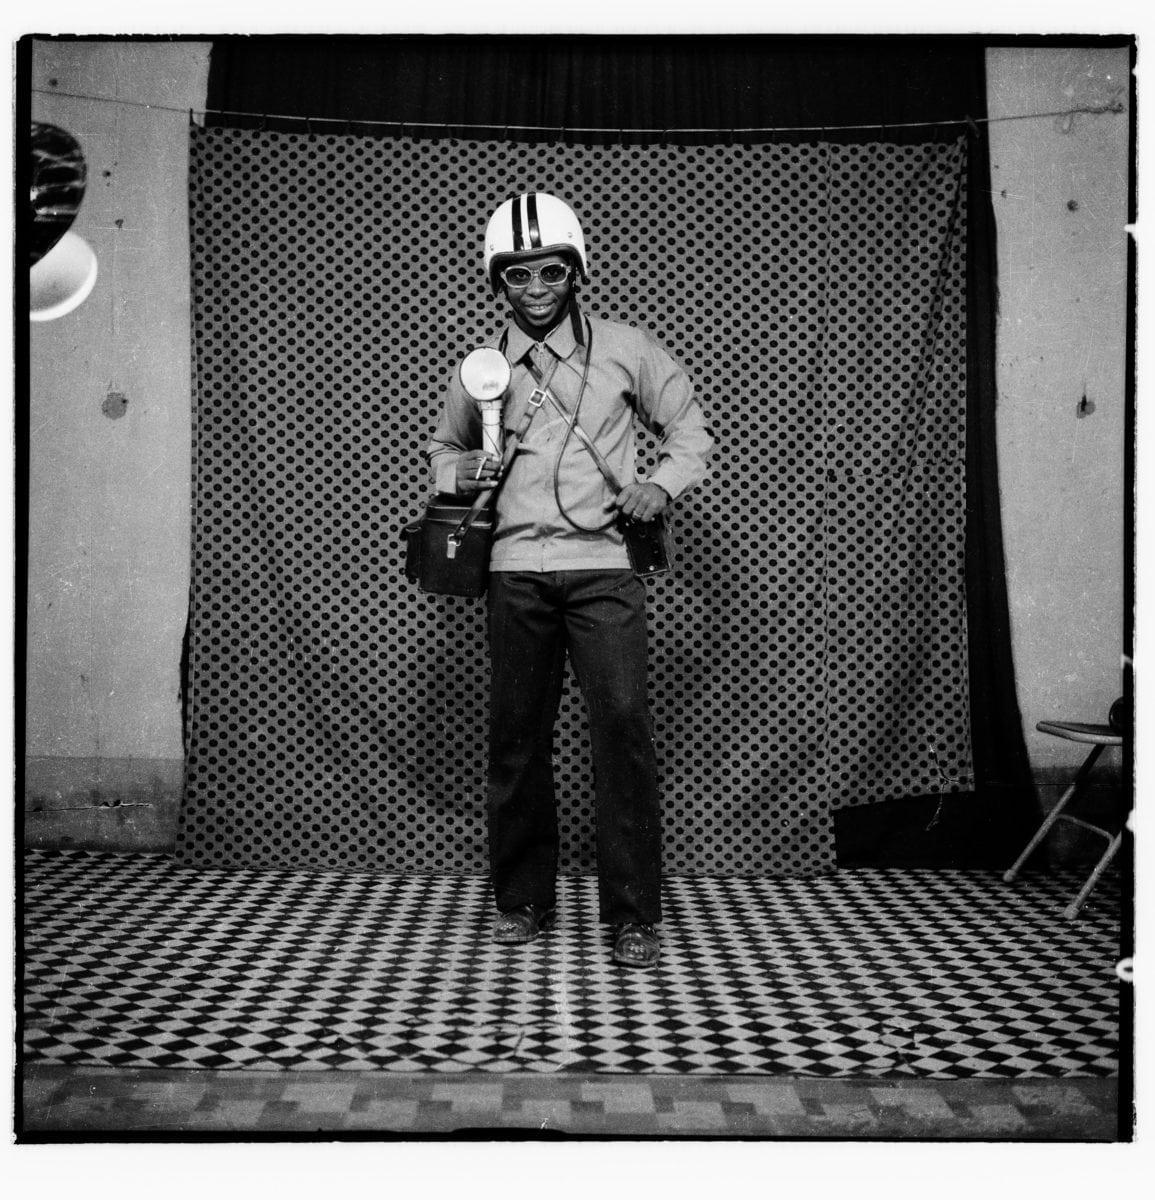 Sanlé Sory, Sory photographe, 1968 with Yossi Milo Gallery, New York